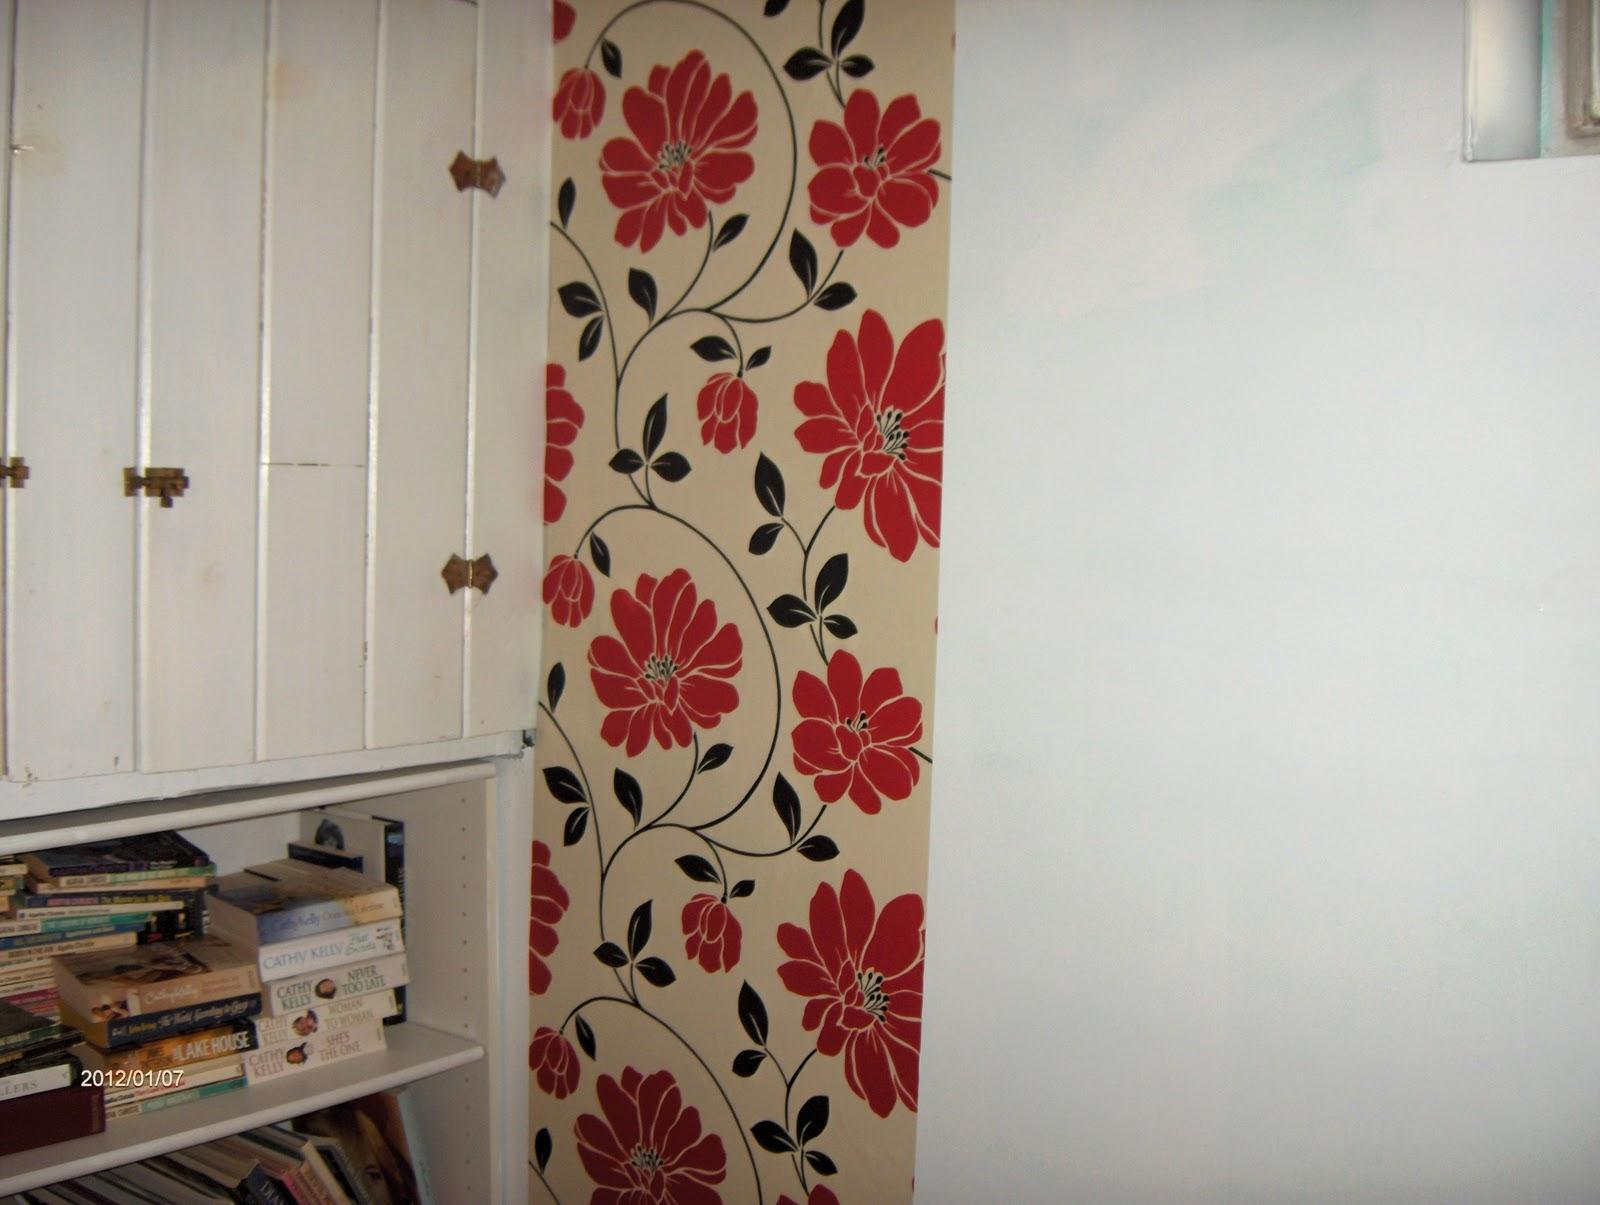 http://4.bp.blogspot.com/-SaLAefz_TwQ/Twy8V1lAqCI/AAAAAAAABCE/FjFQYYWIYR8/s1600/wallpaper+001.JPG